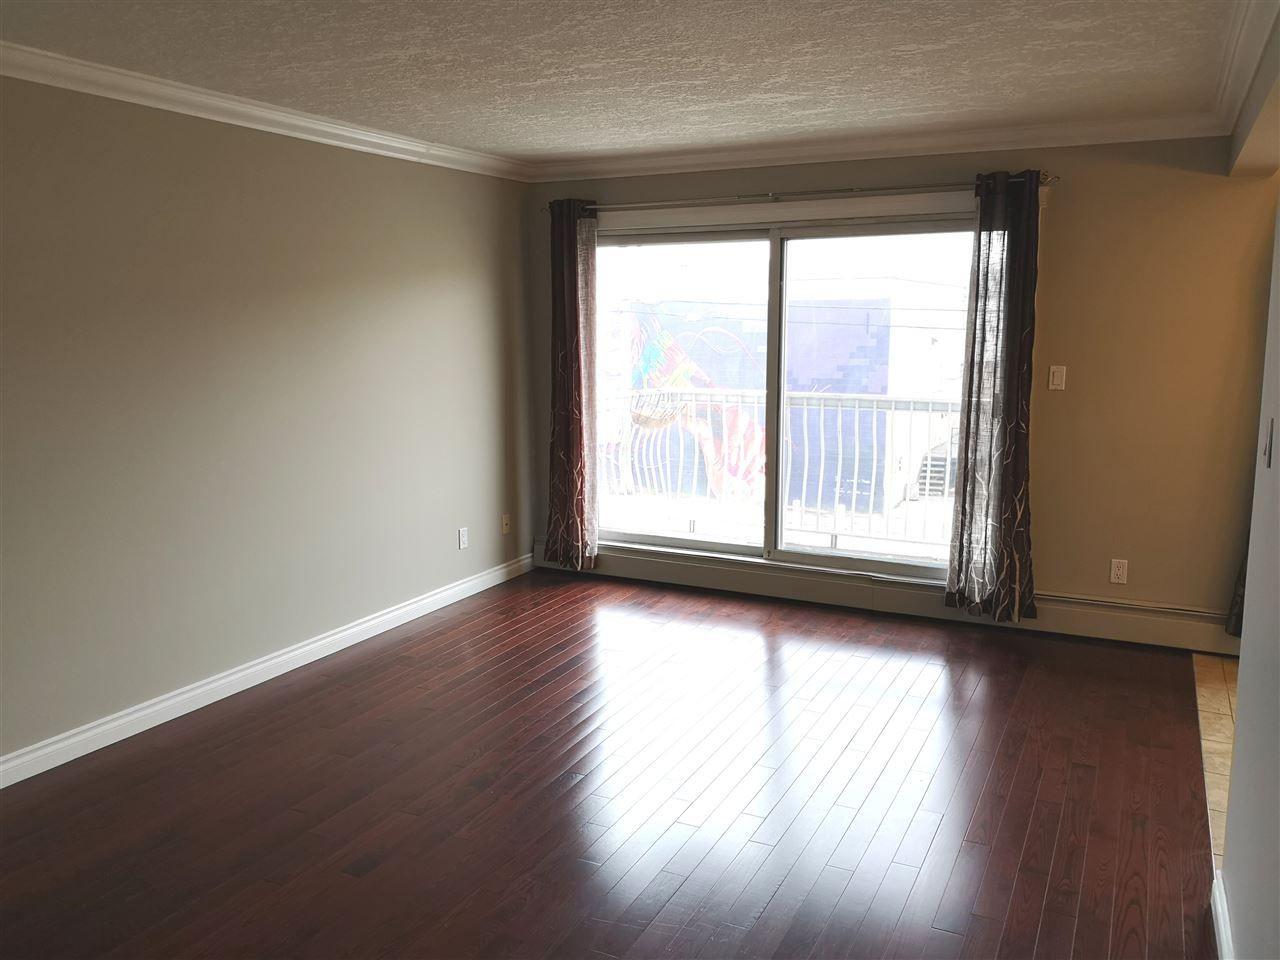 hardwood flooring edmonton ab of remax river city i real estate edmonton ab canada in 304 10625 83 avenue edmonton t6e 2e3 zone 15